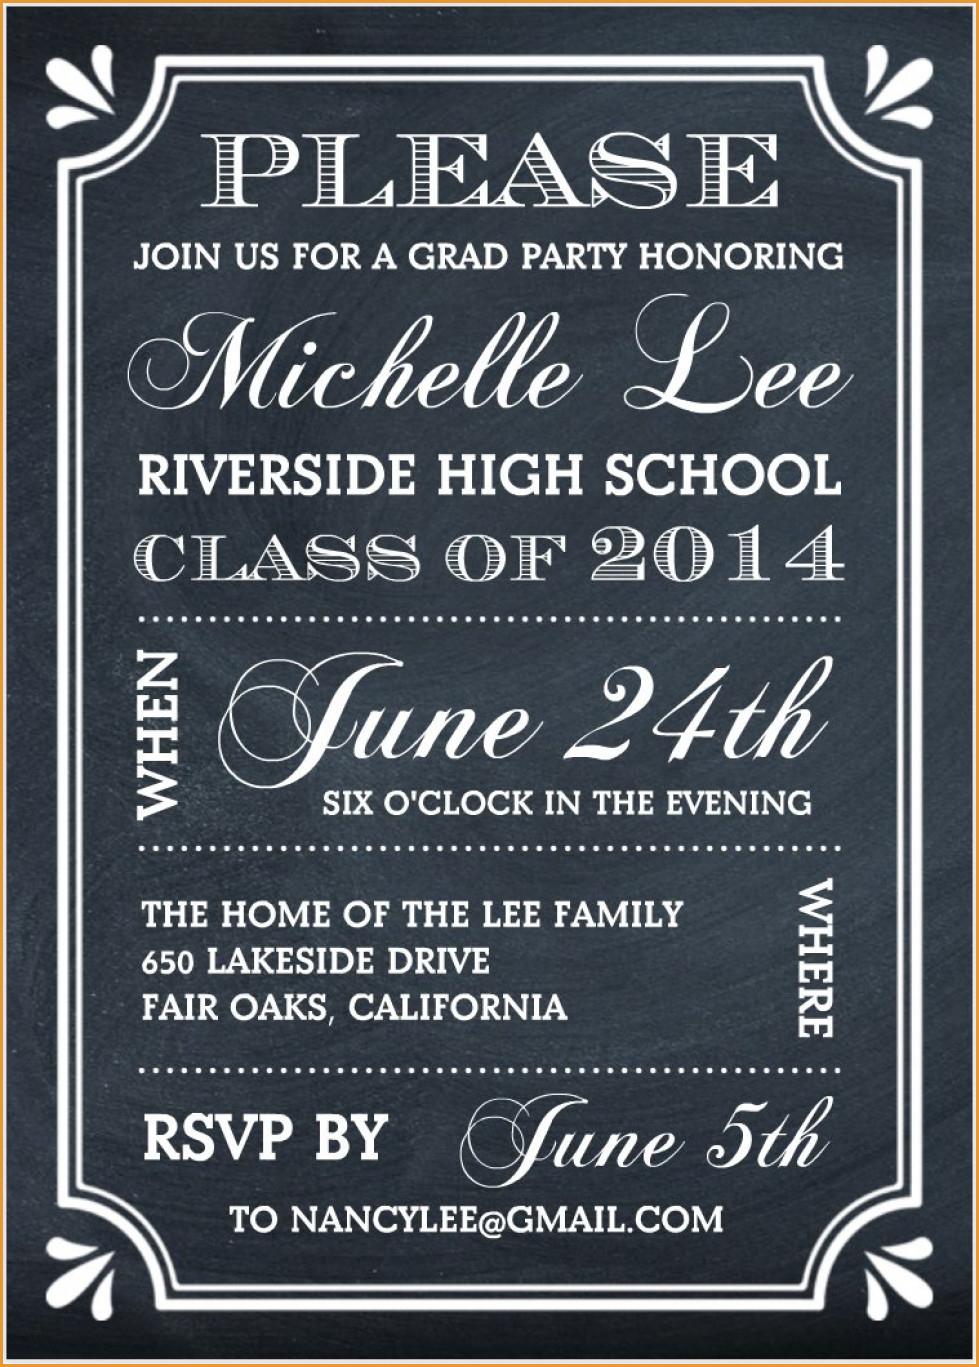 Party Invitations: Elegant Free Graduation Party Invitations Designs - Free Printable Graduation Party Invitations 2014